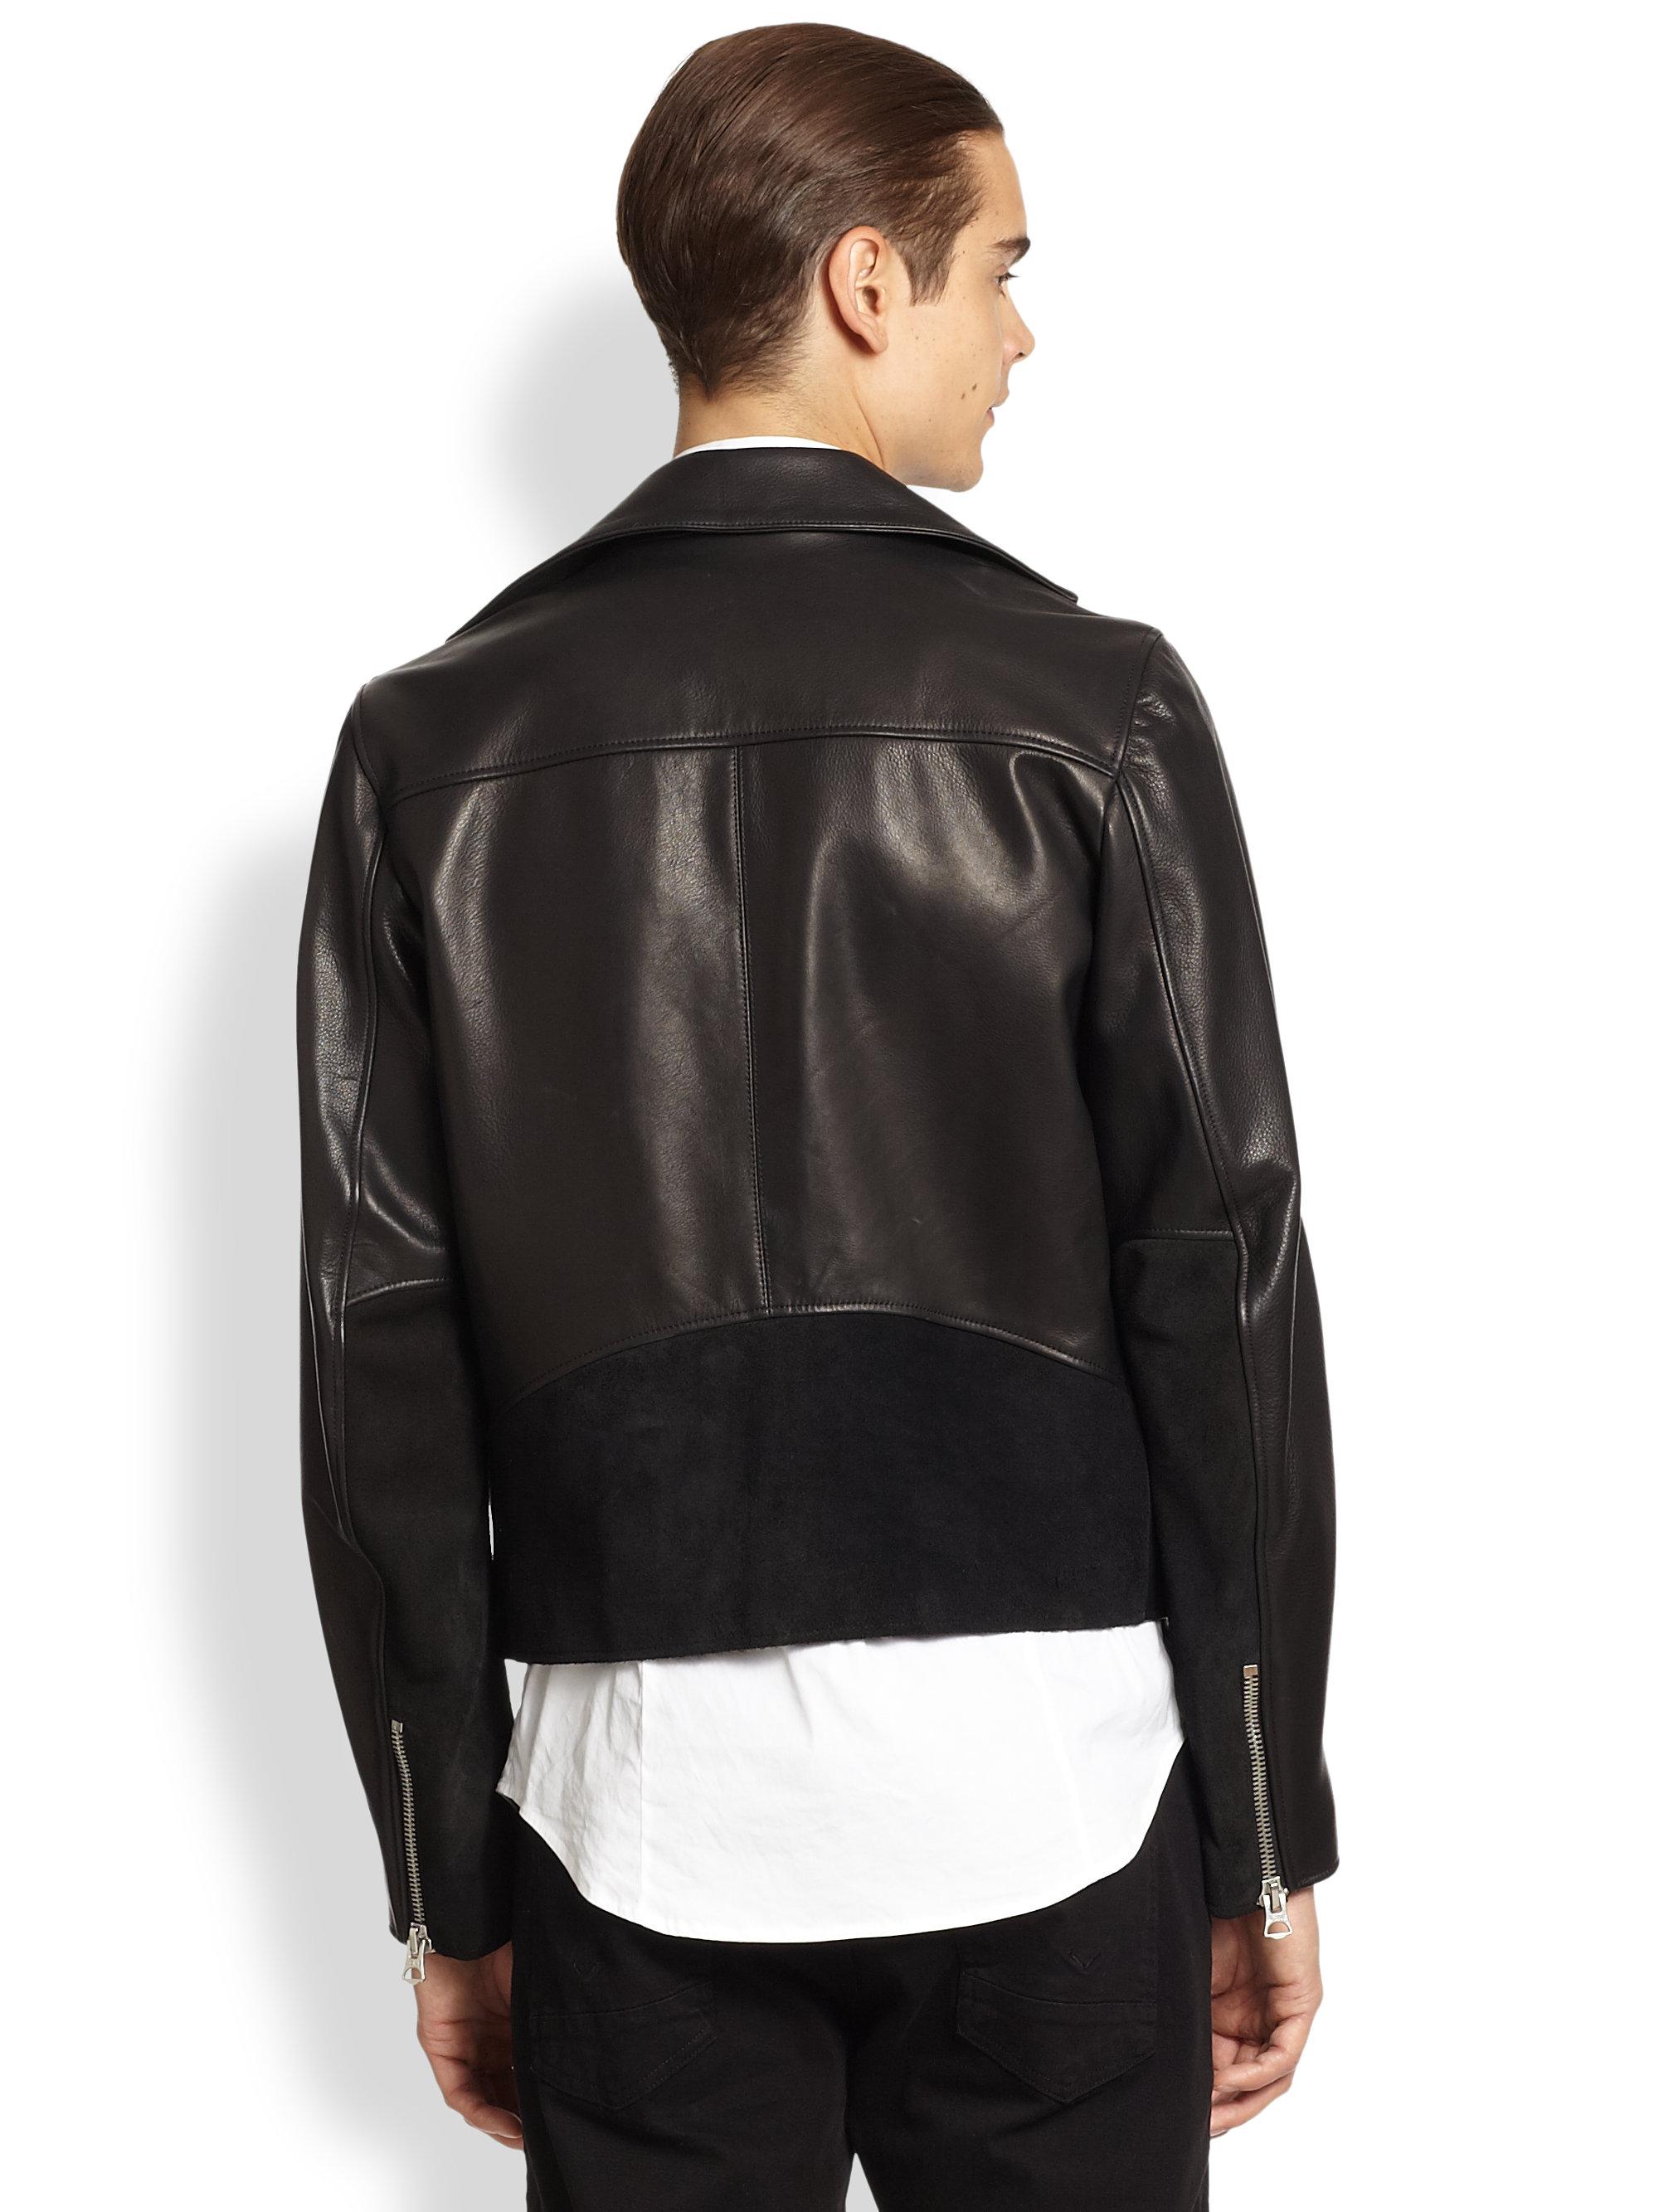 Acne studios Leather Suede Biker Jacket in Black for Men | Lyst